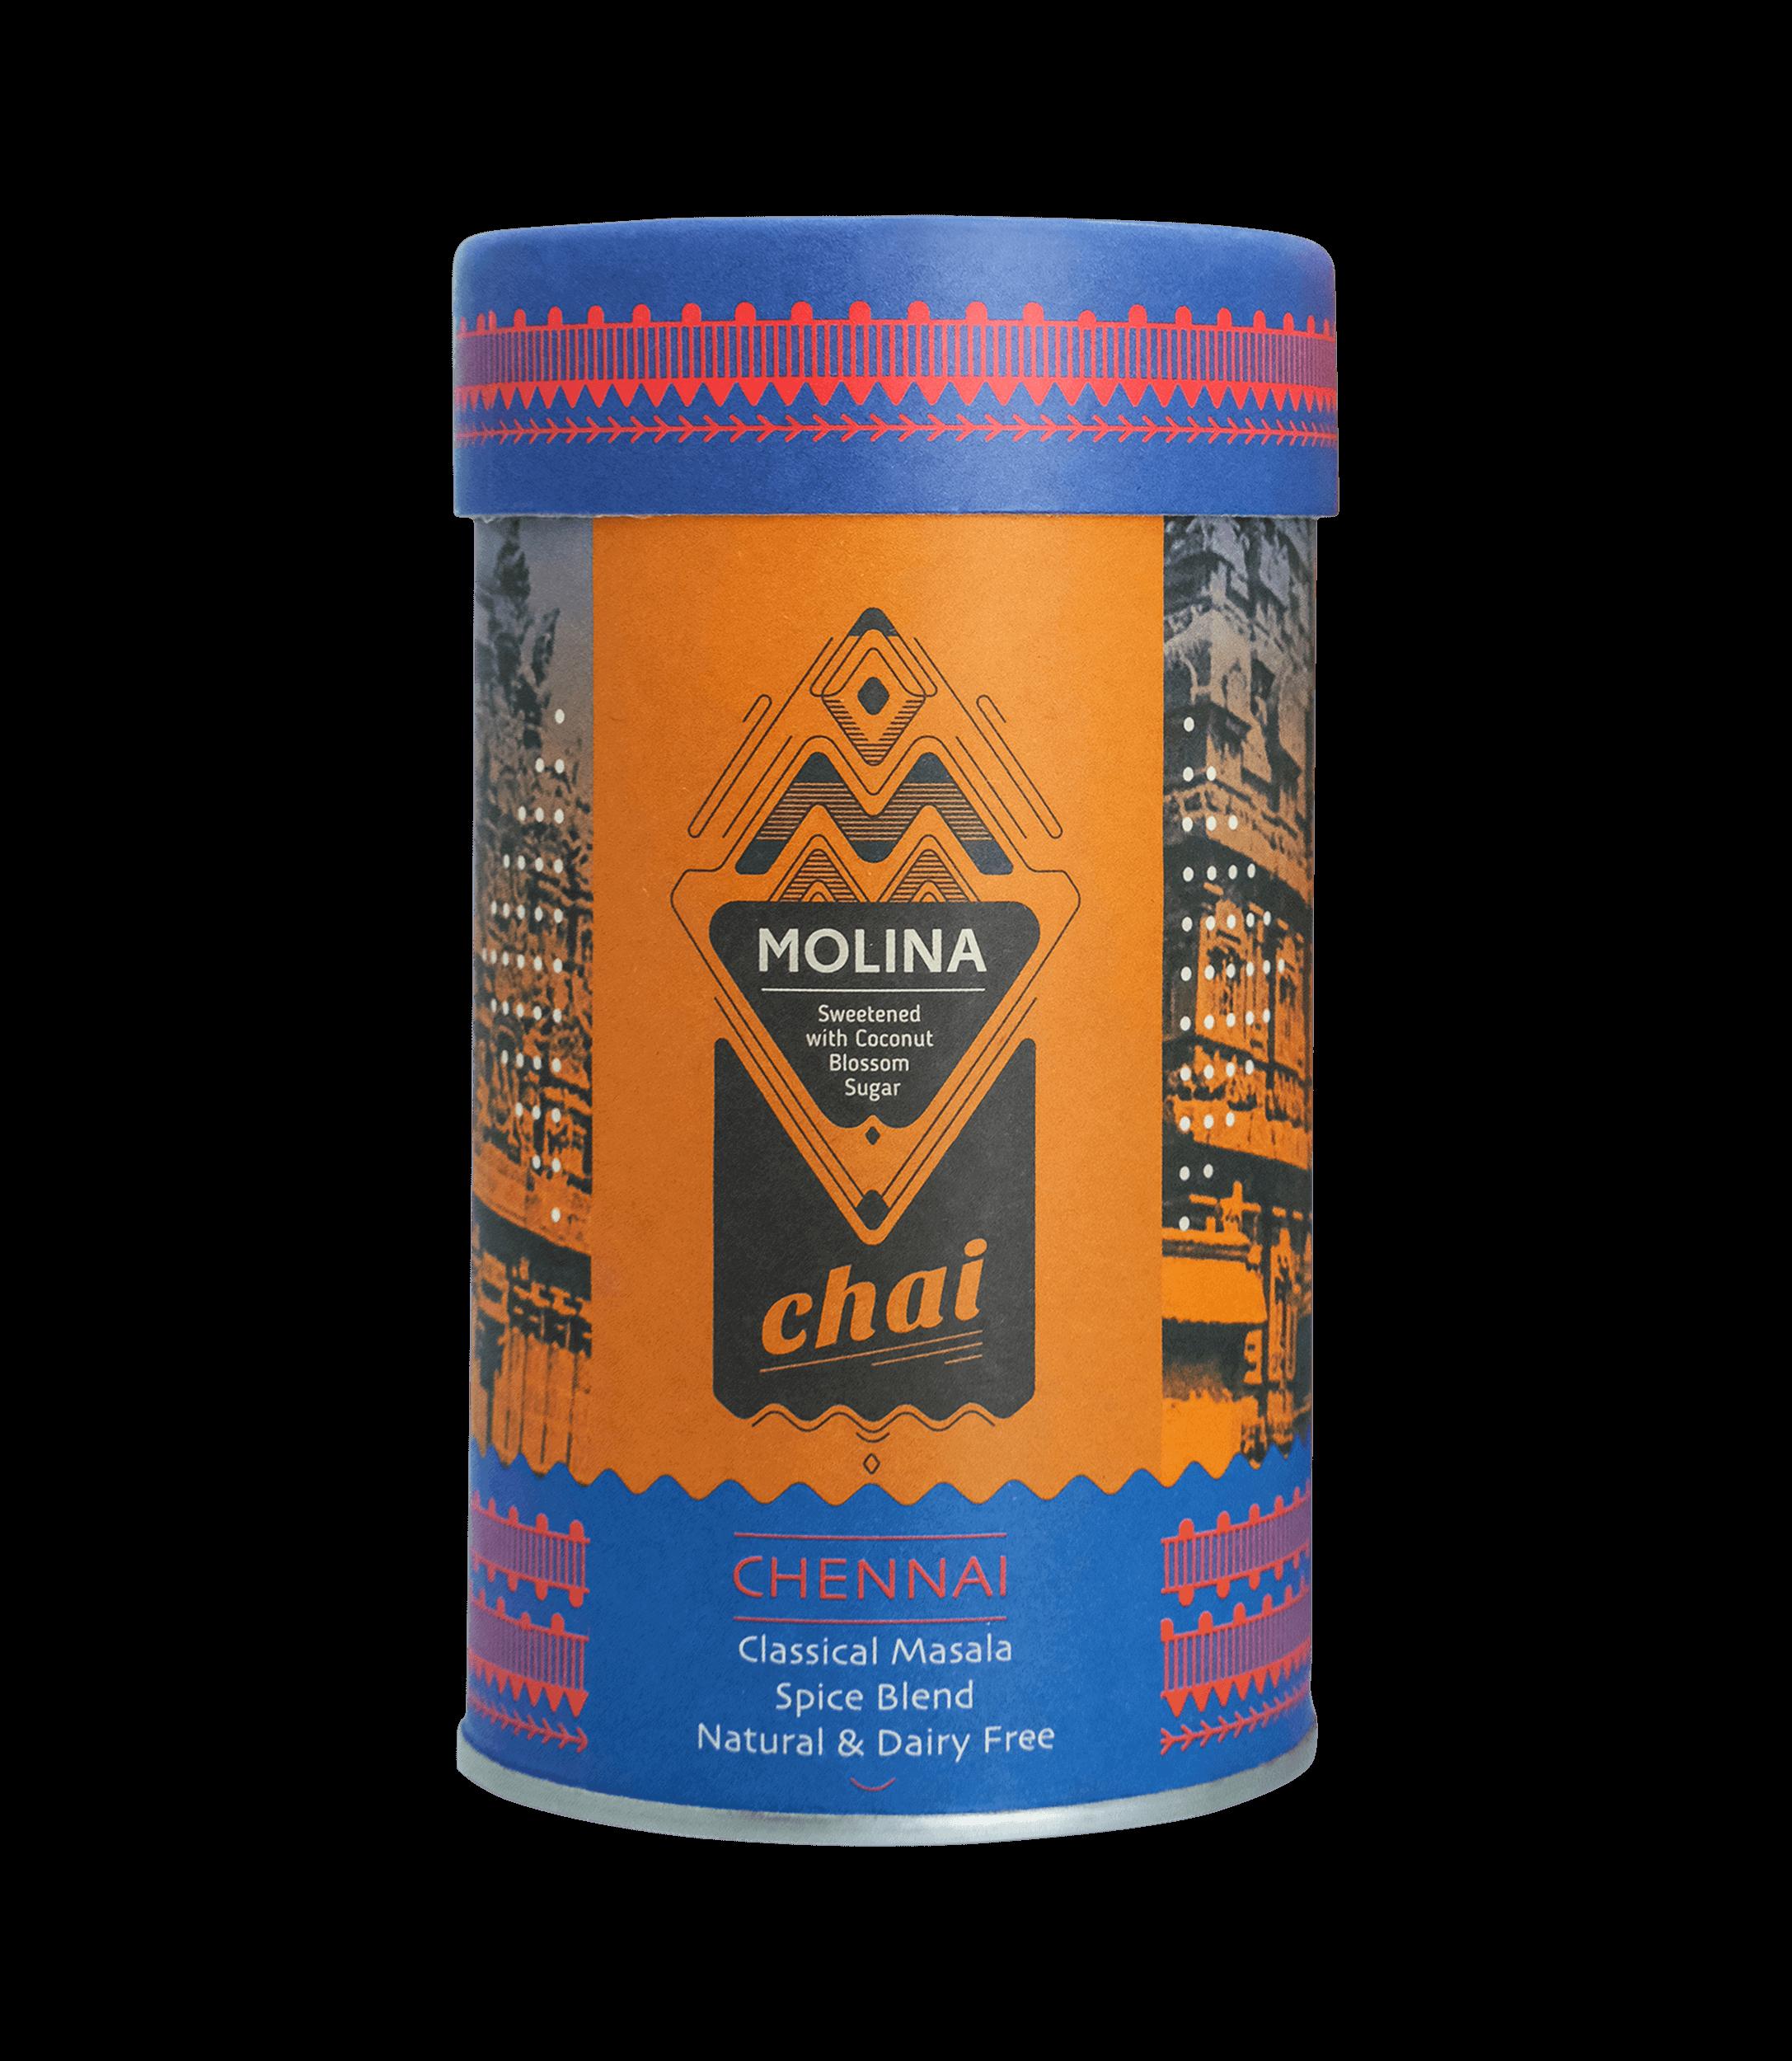 Molina Chai Chennai Vegan